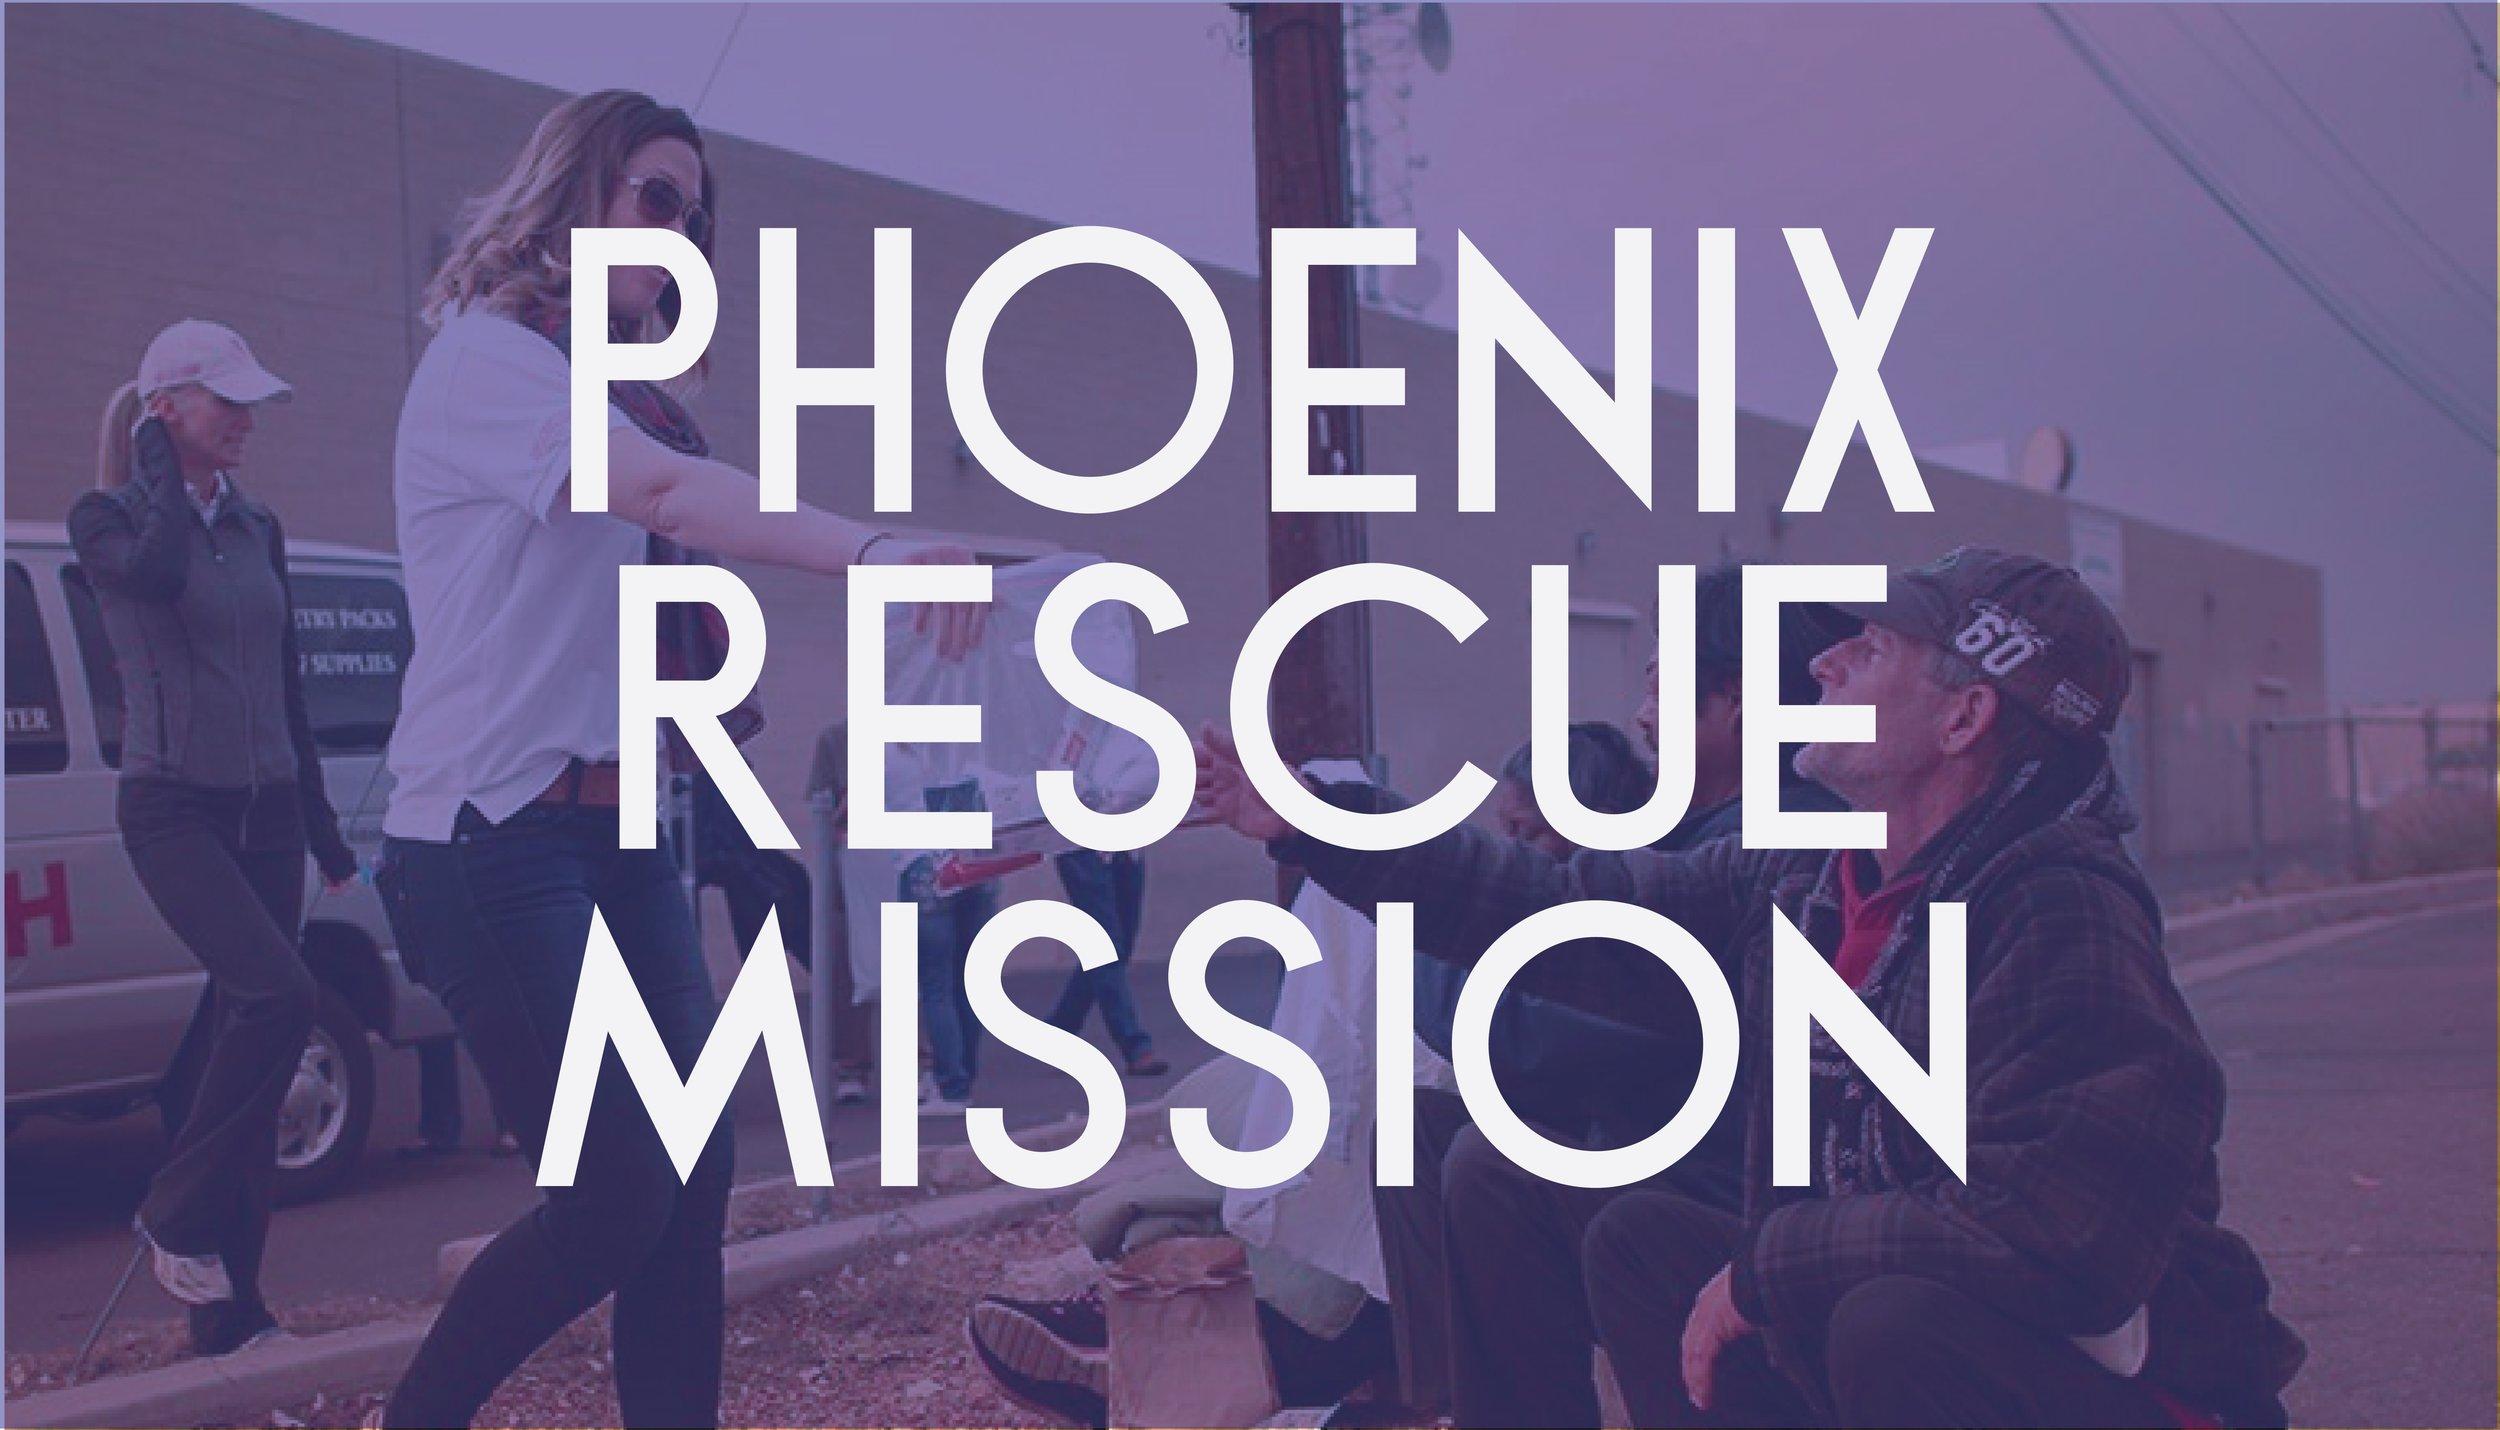 Phoenix Rescue Mission.jpg